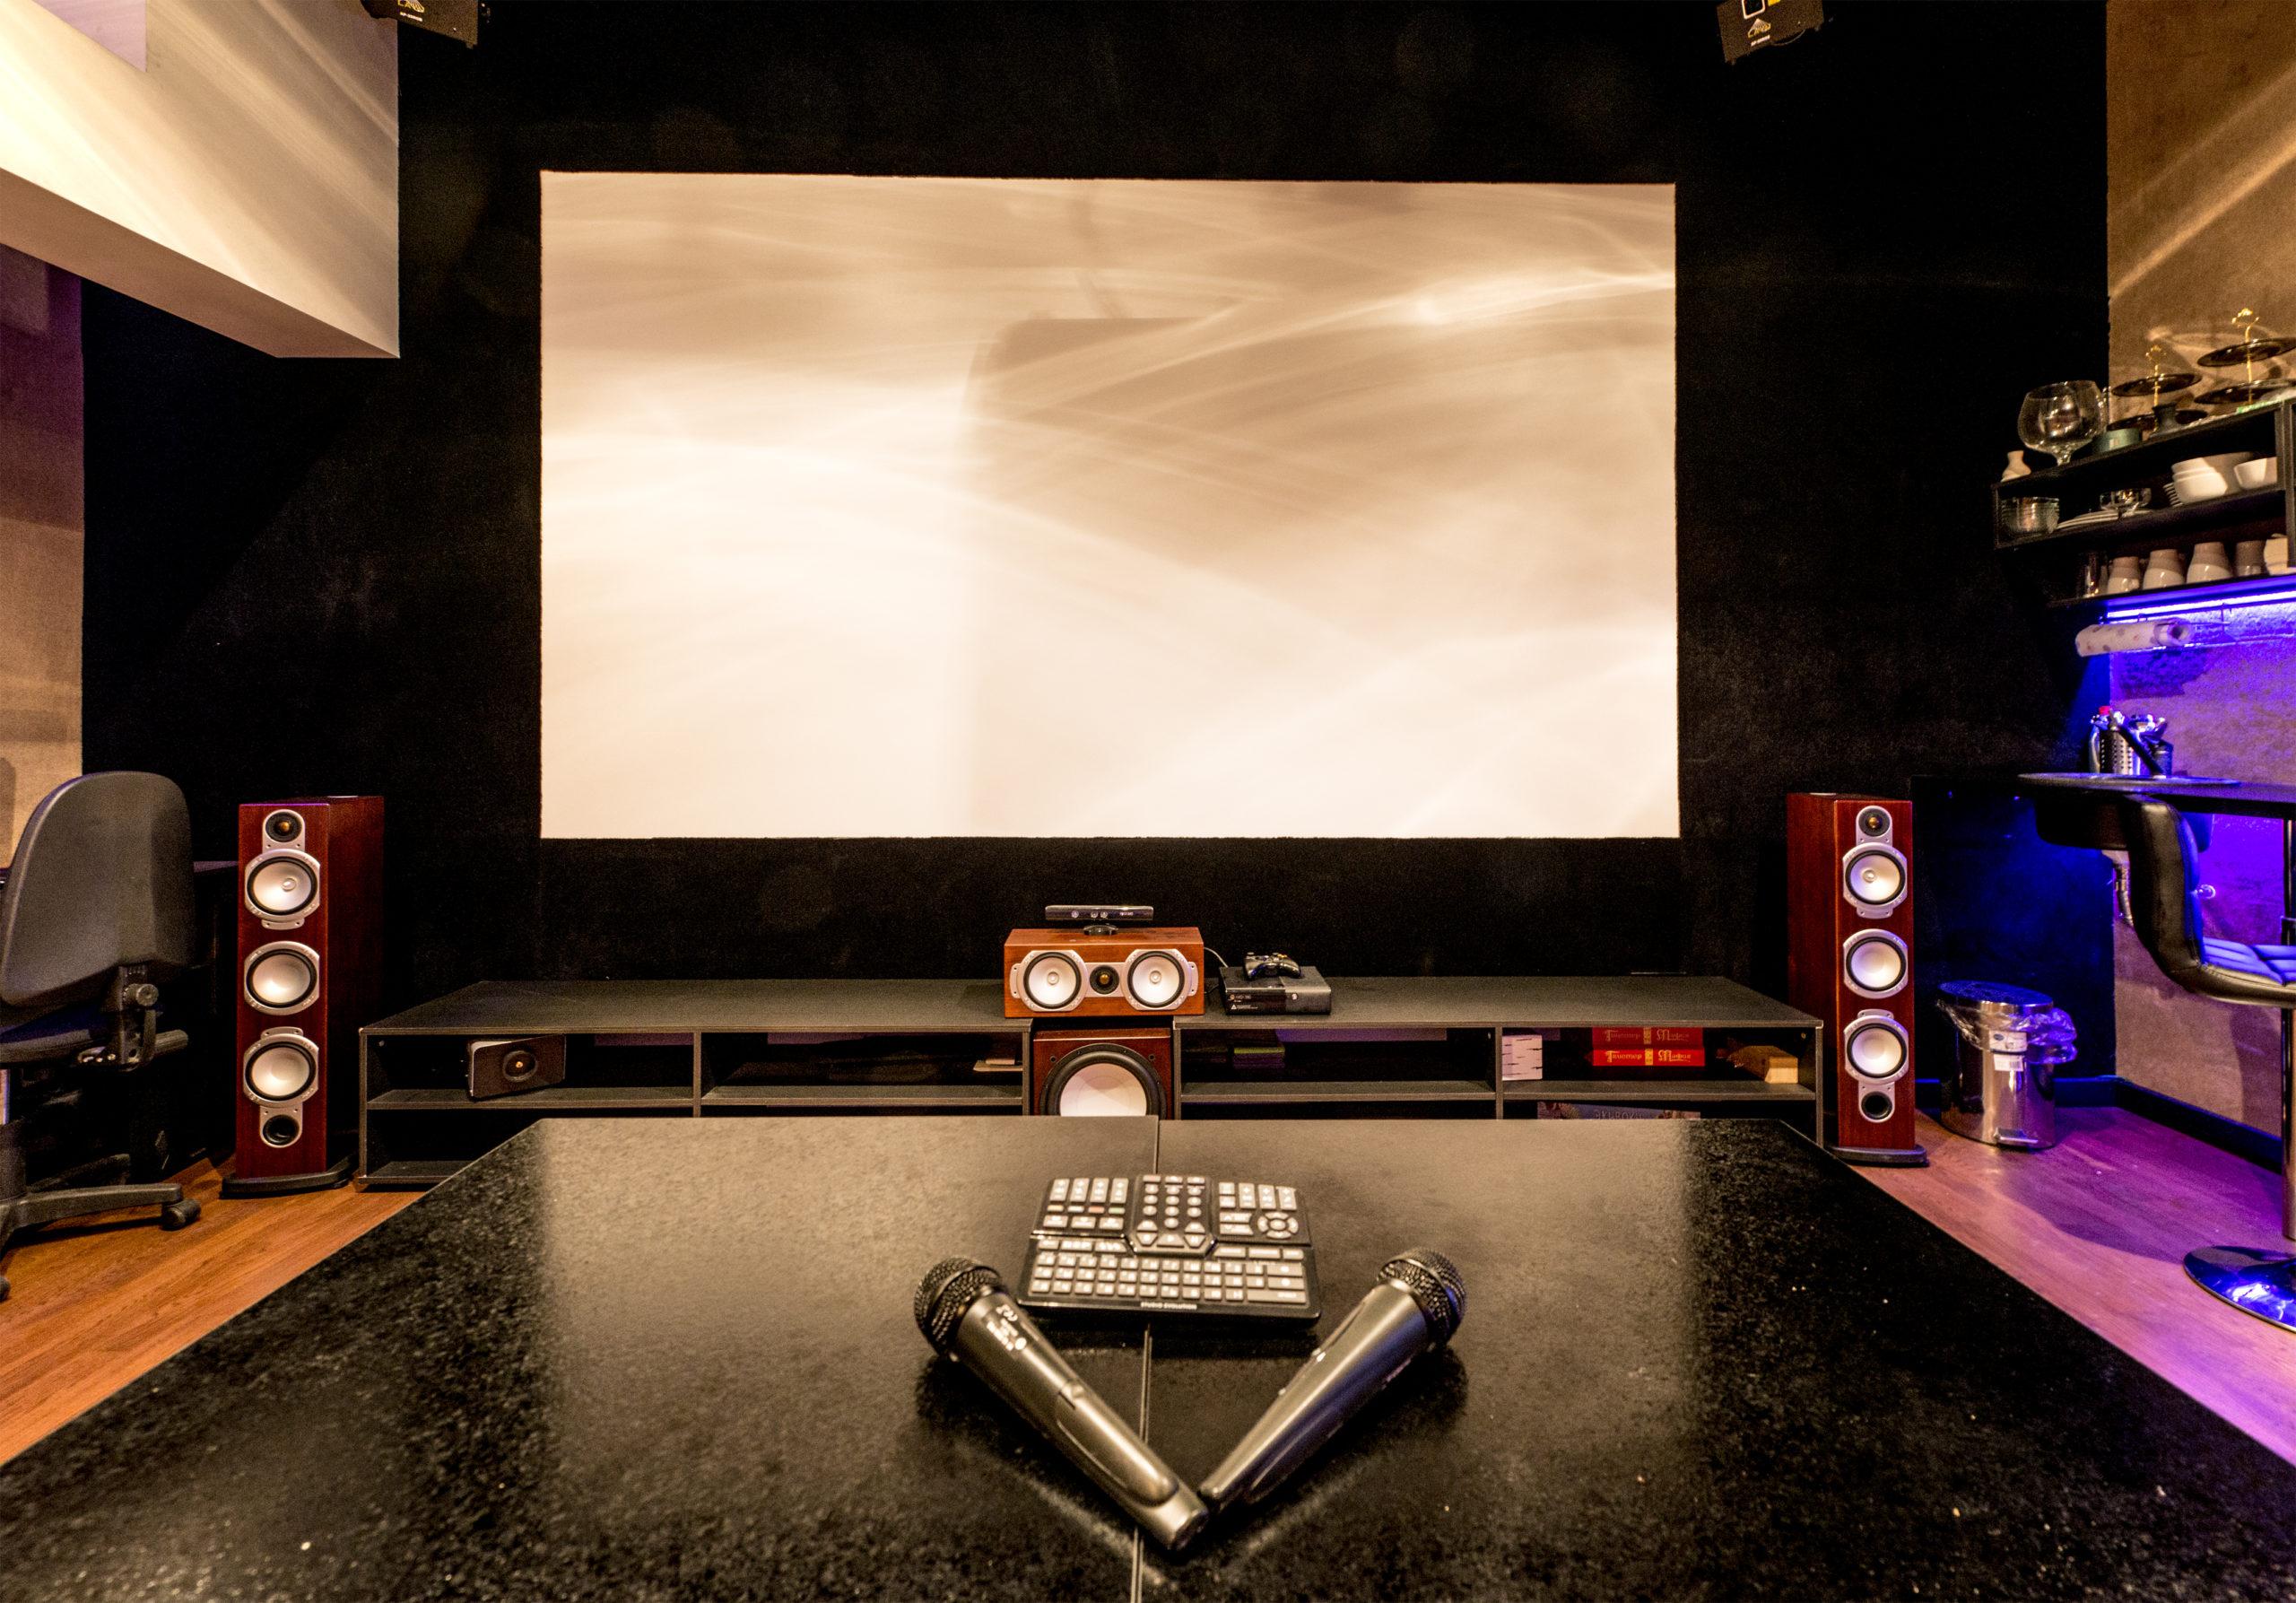 Караоке на телевизоре - как подключить?